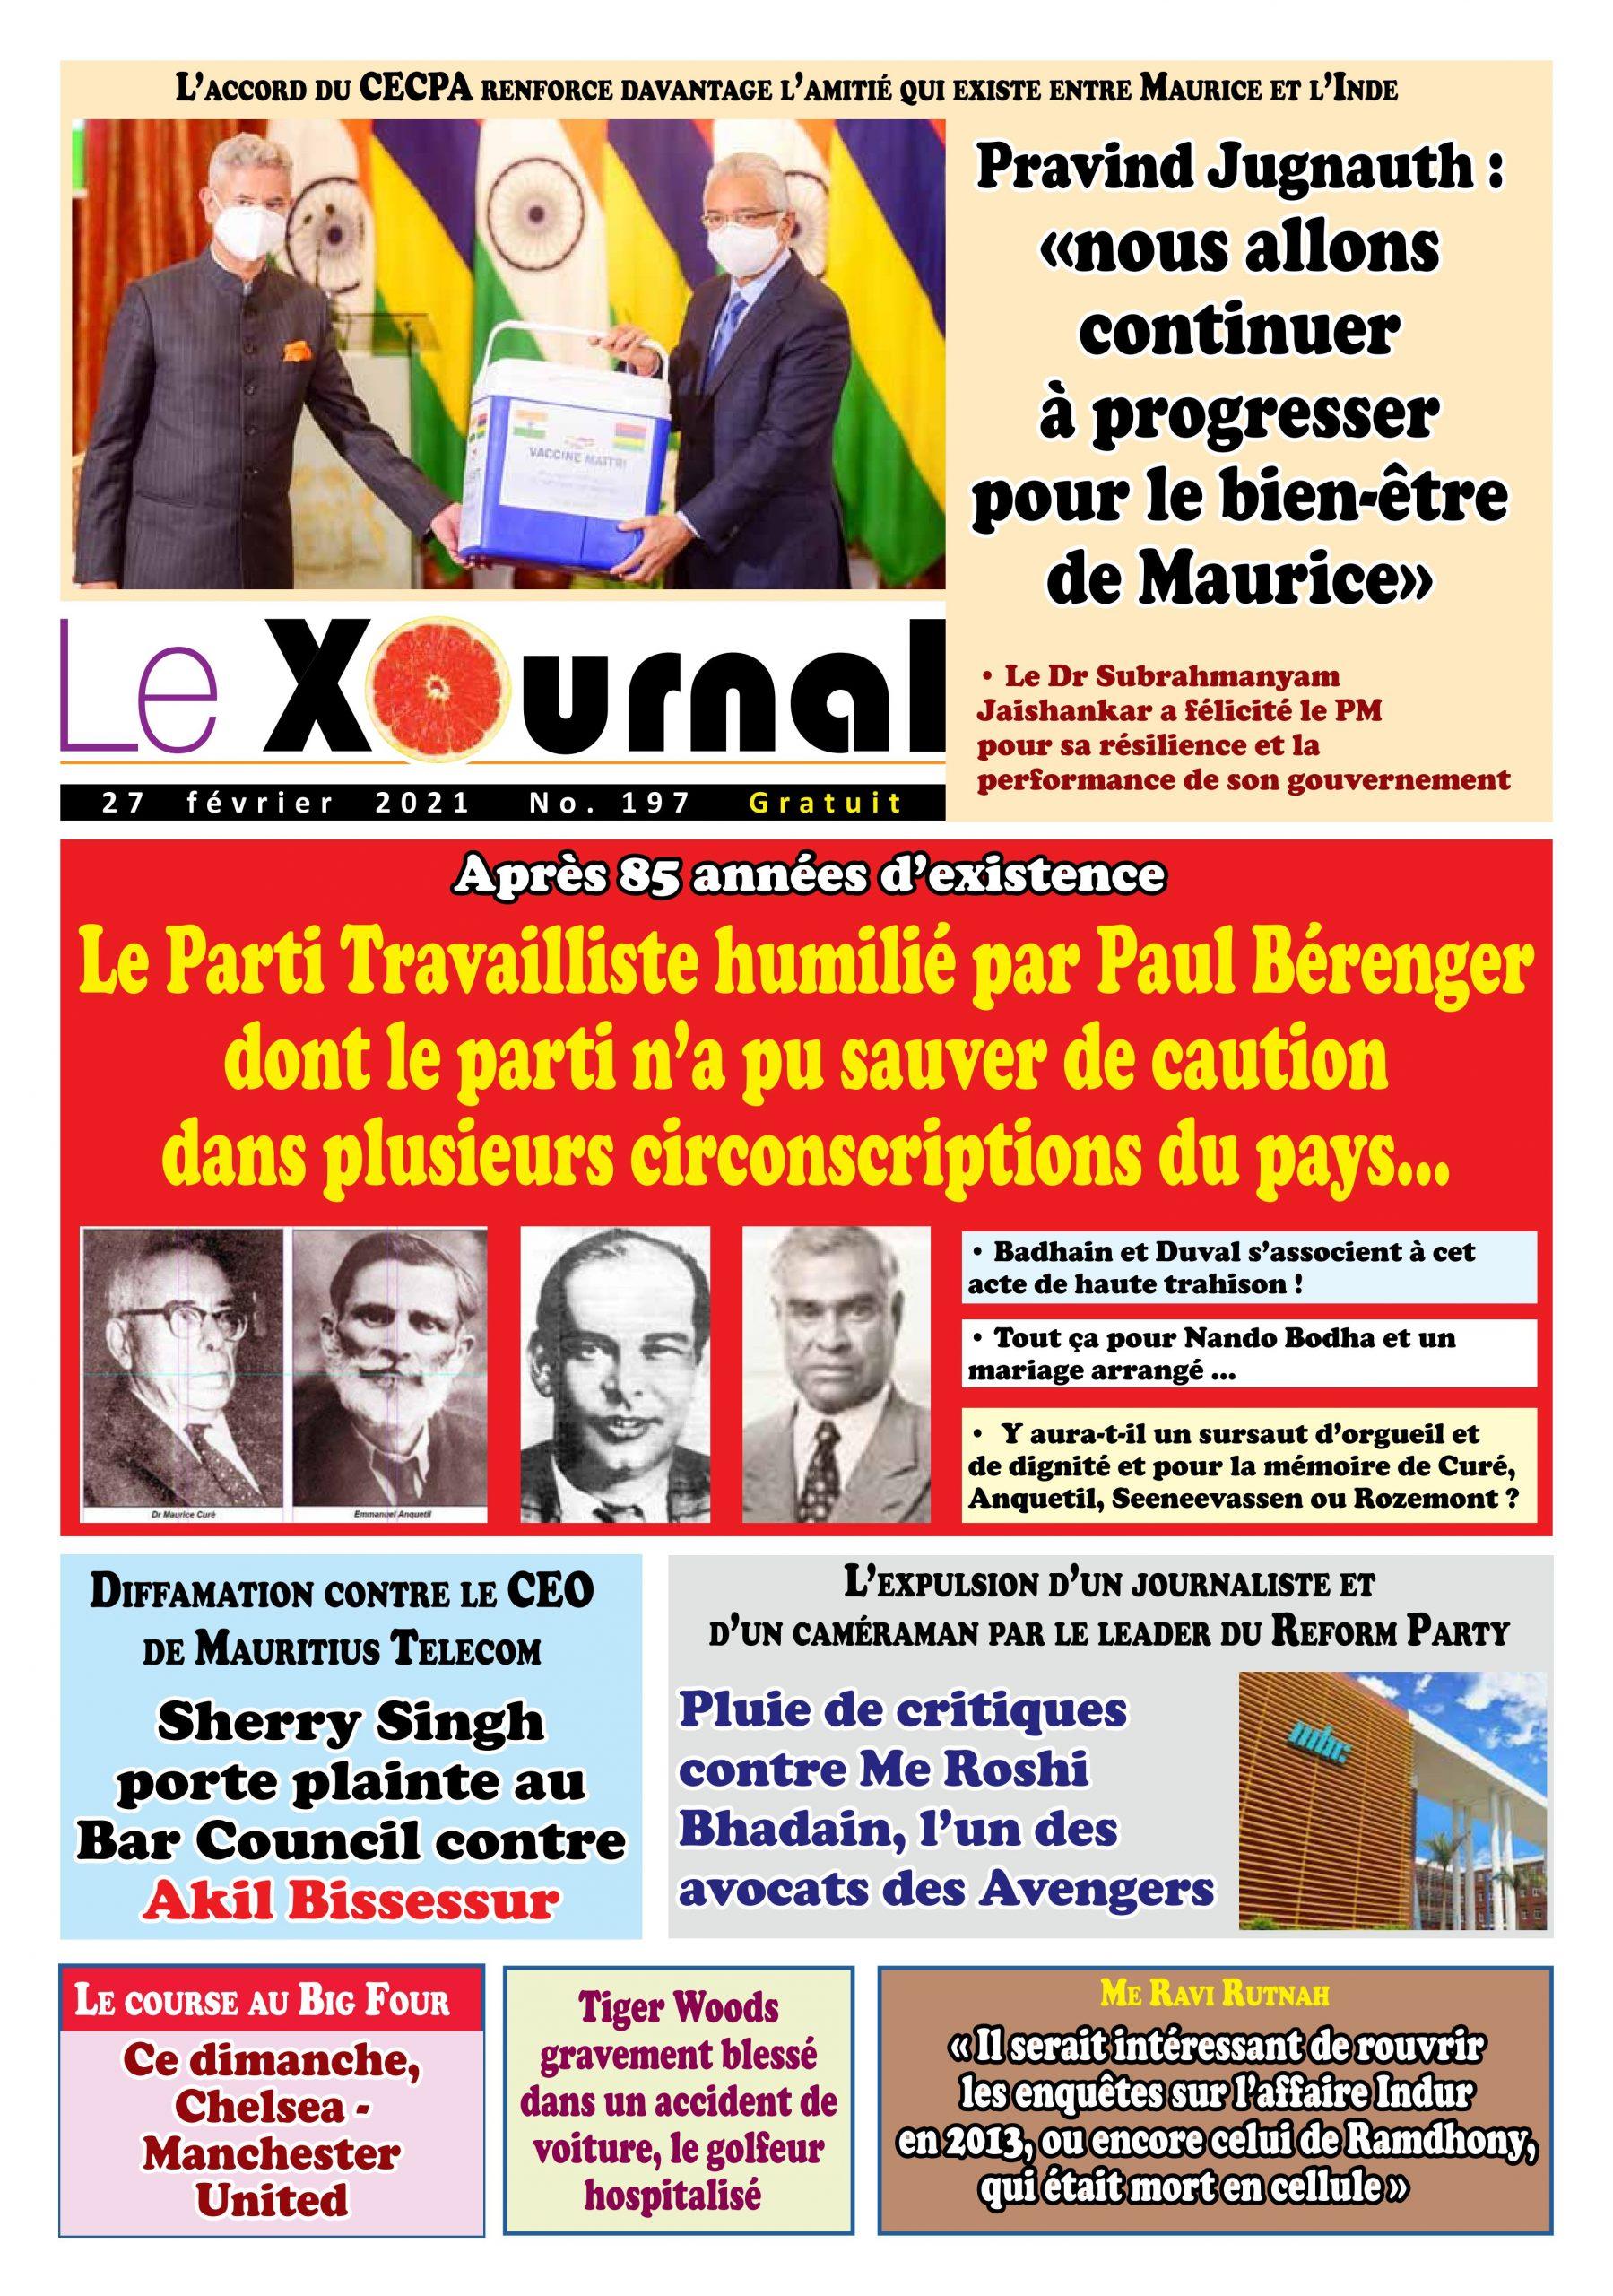 Le Xournal